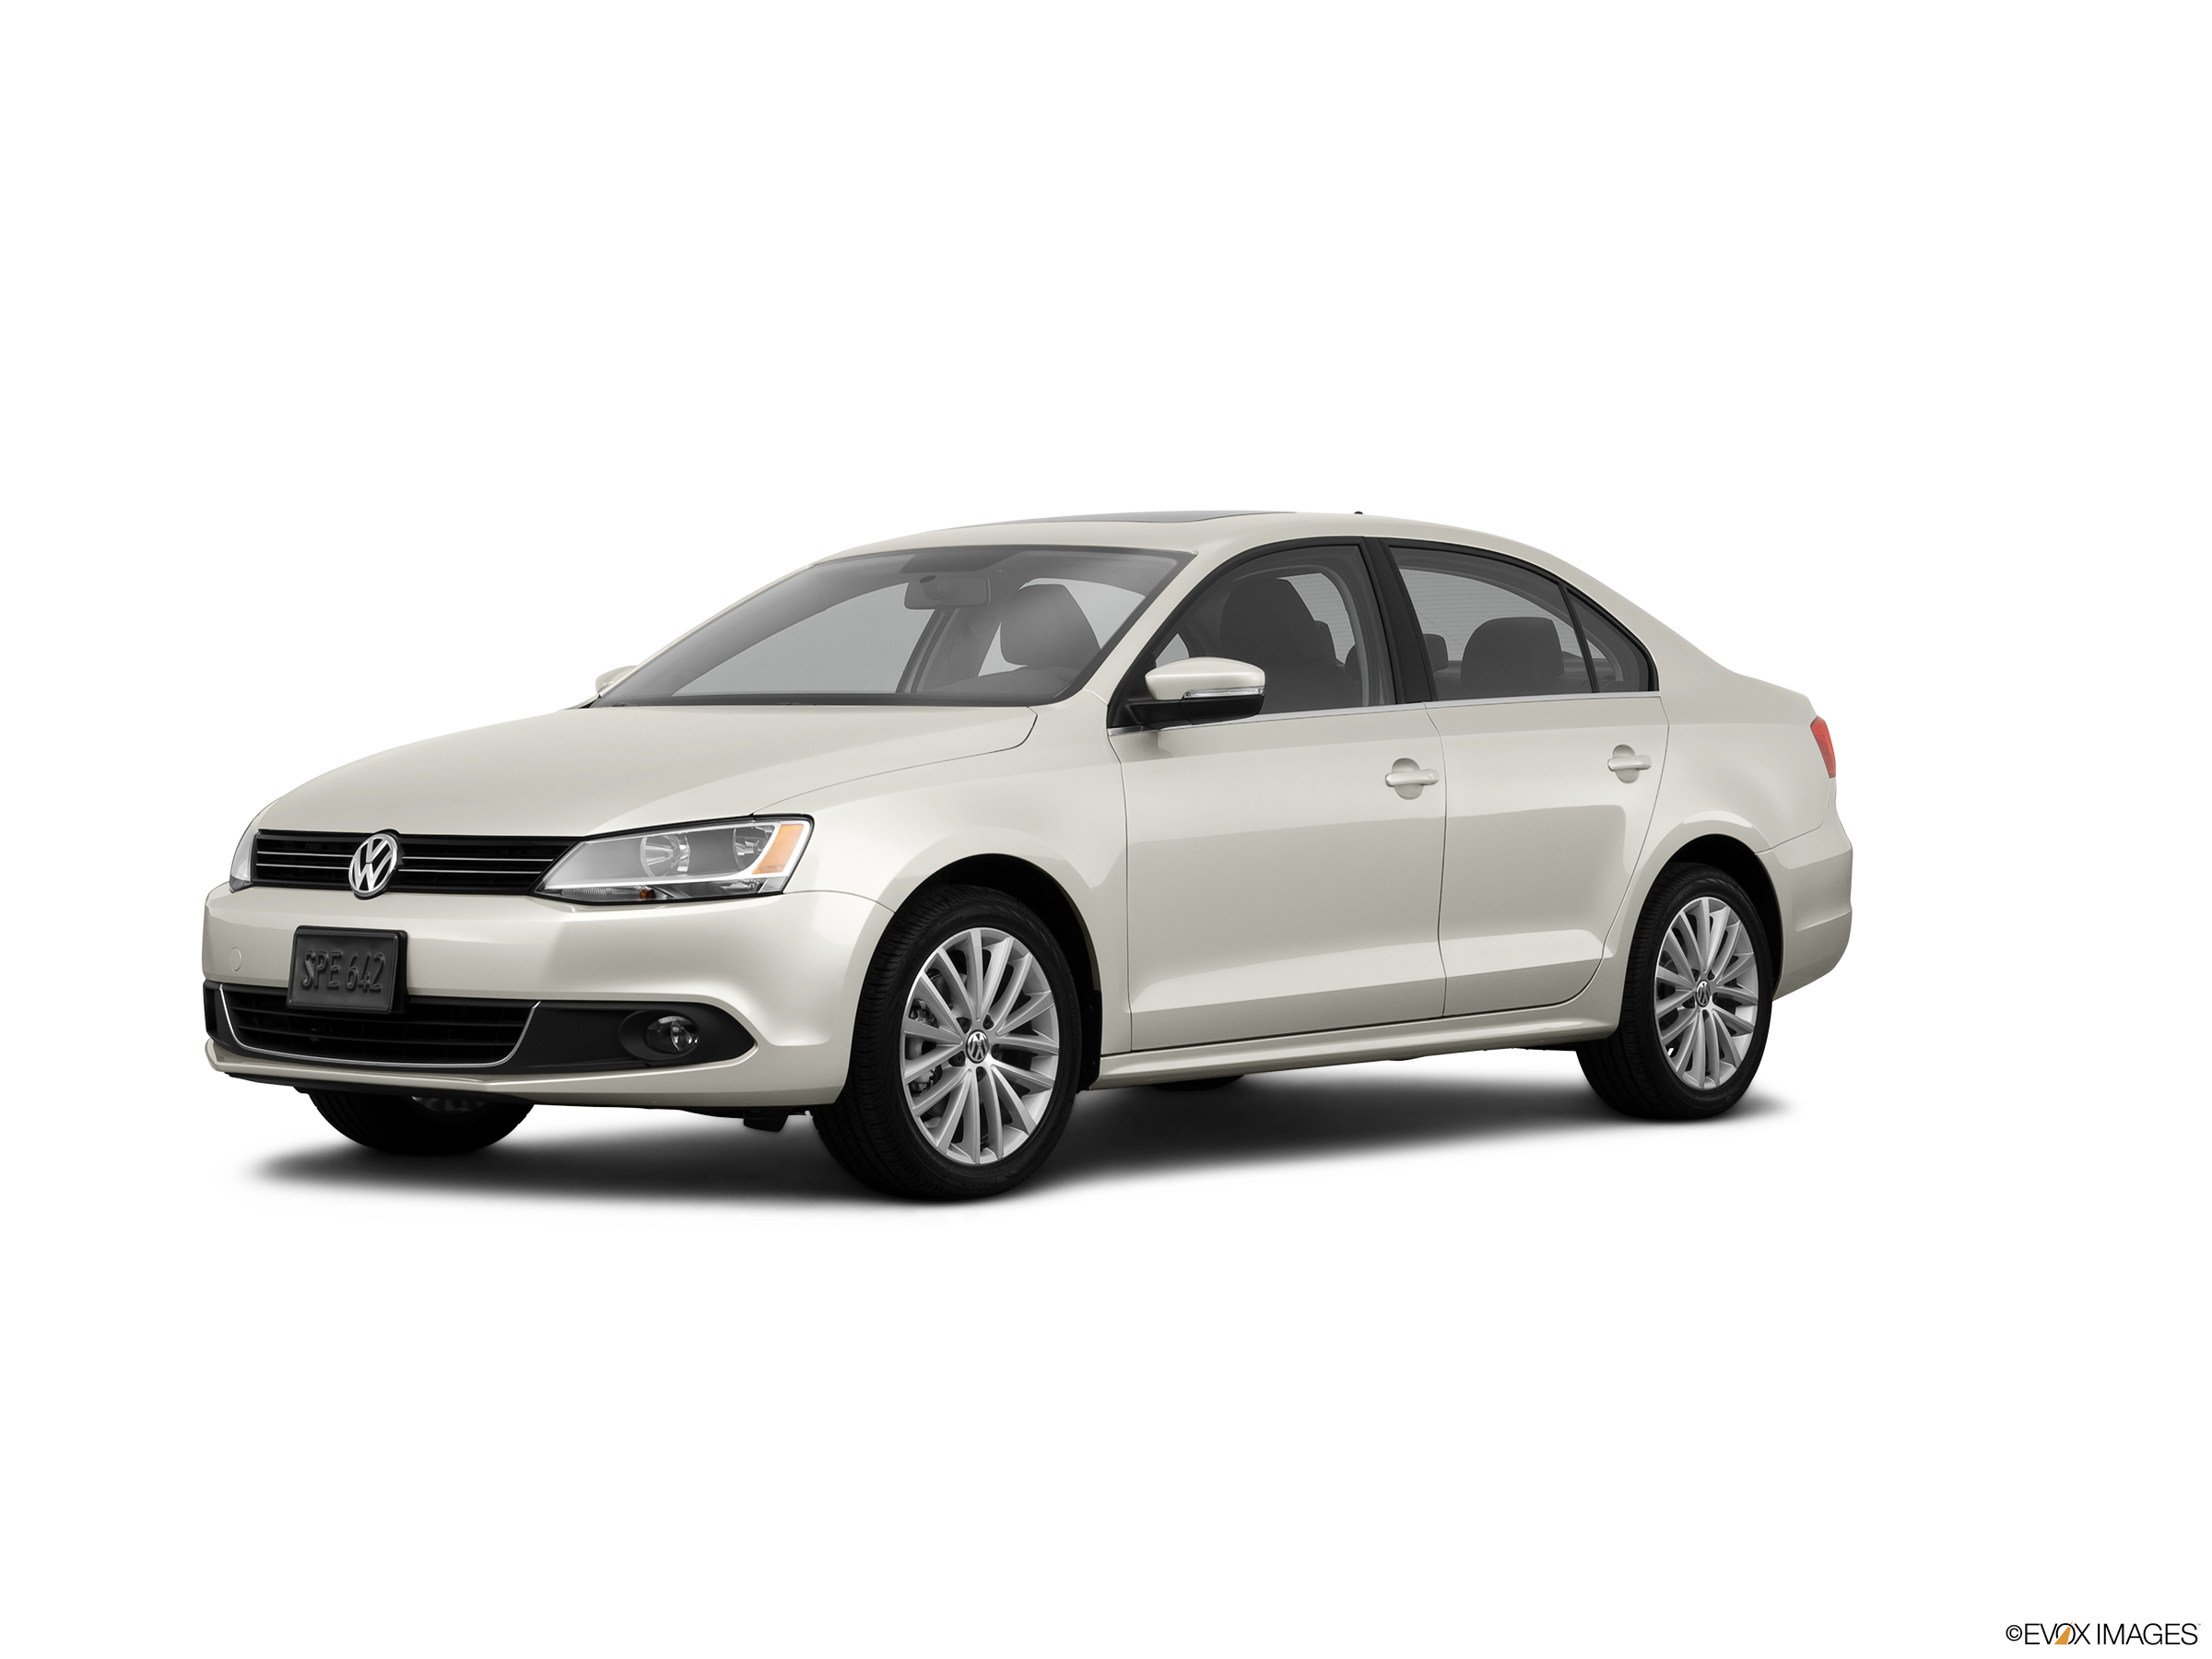 2011 Volkswagen Jetta Values Cars For Sale Kelley Blue Book